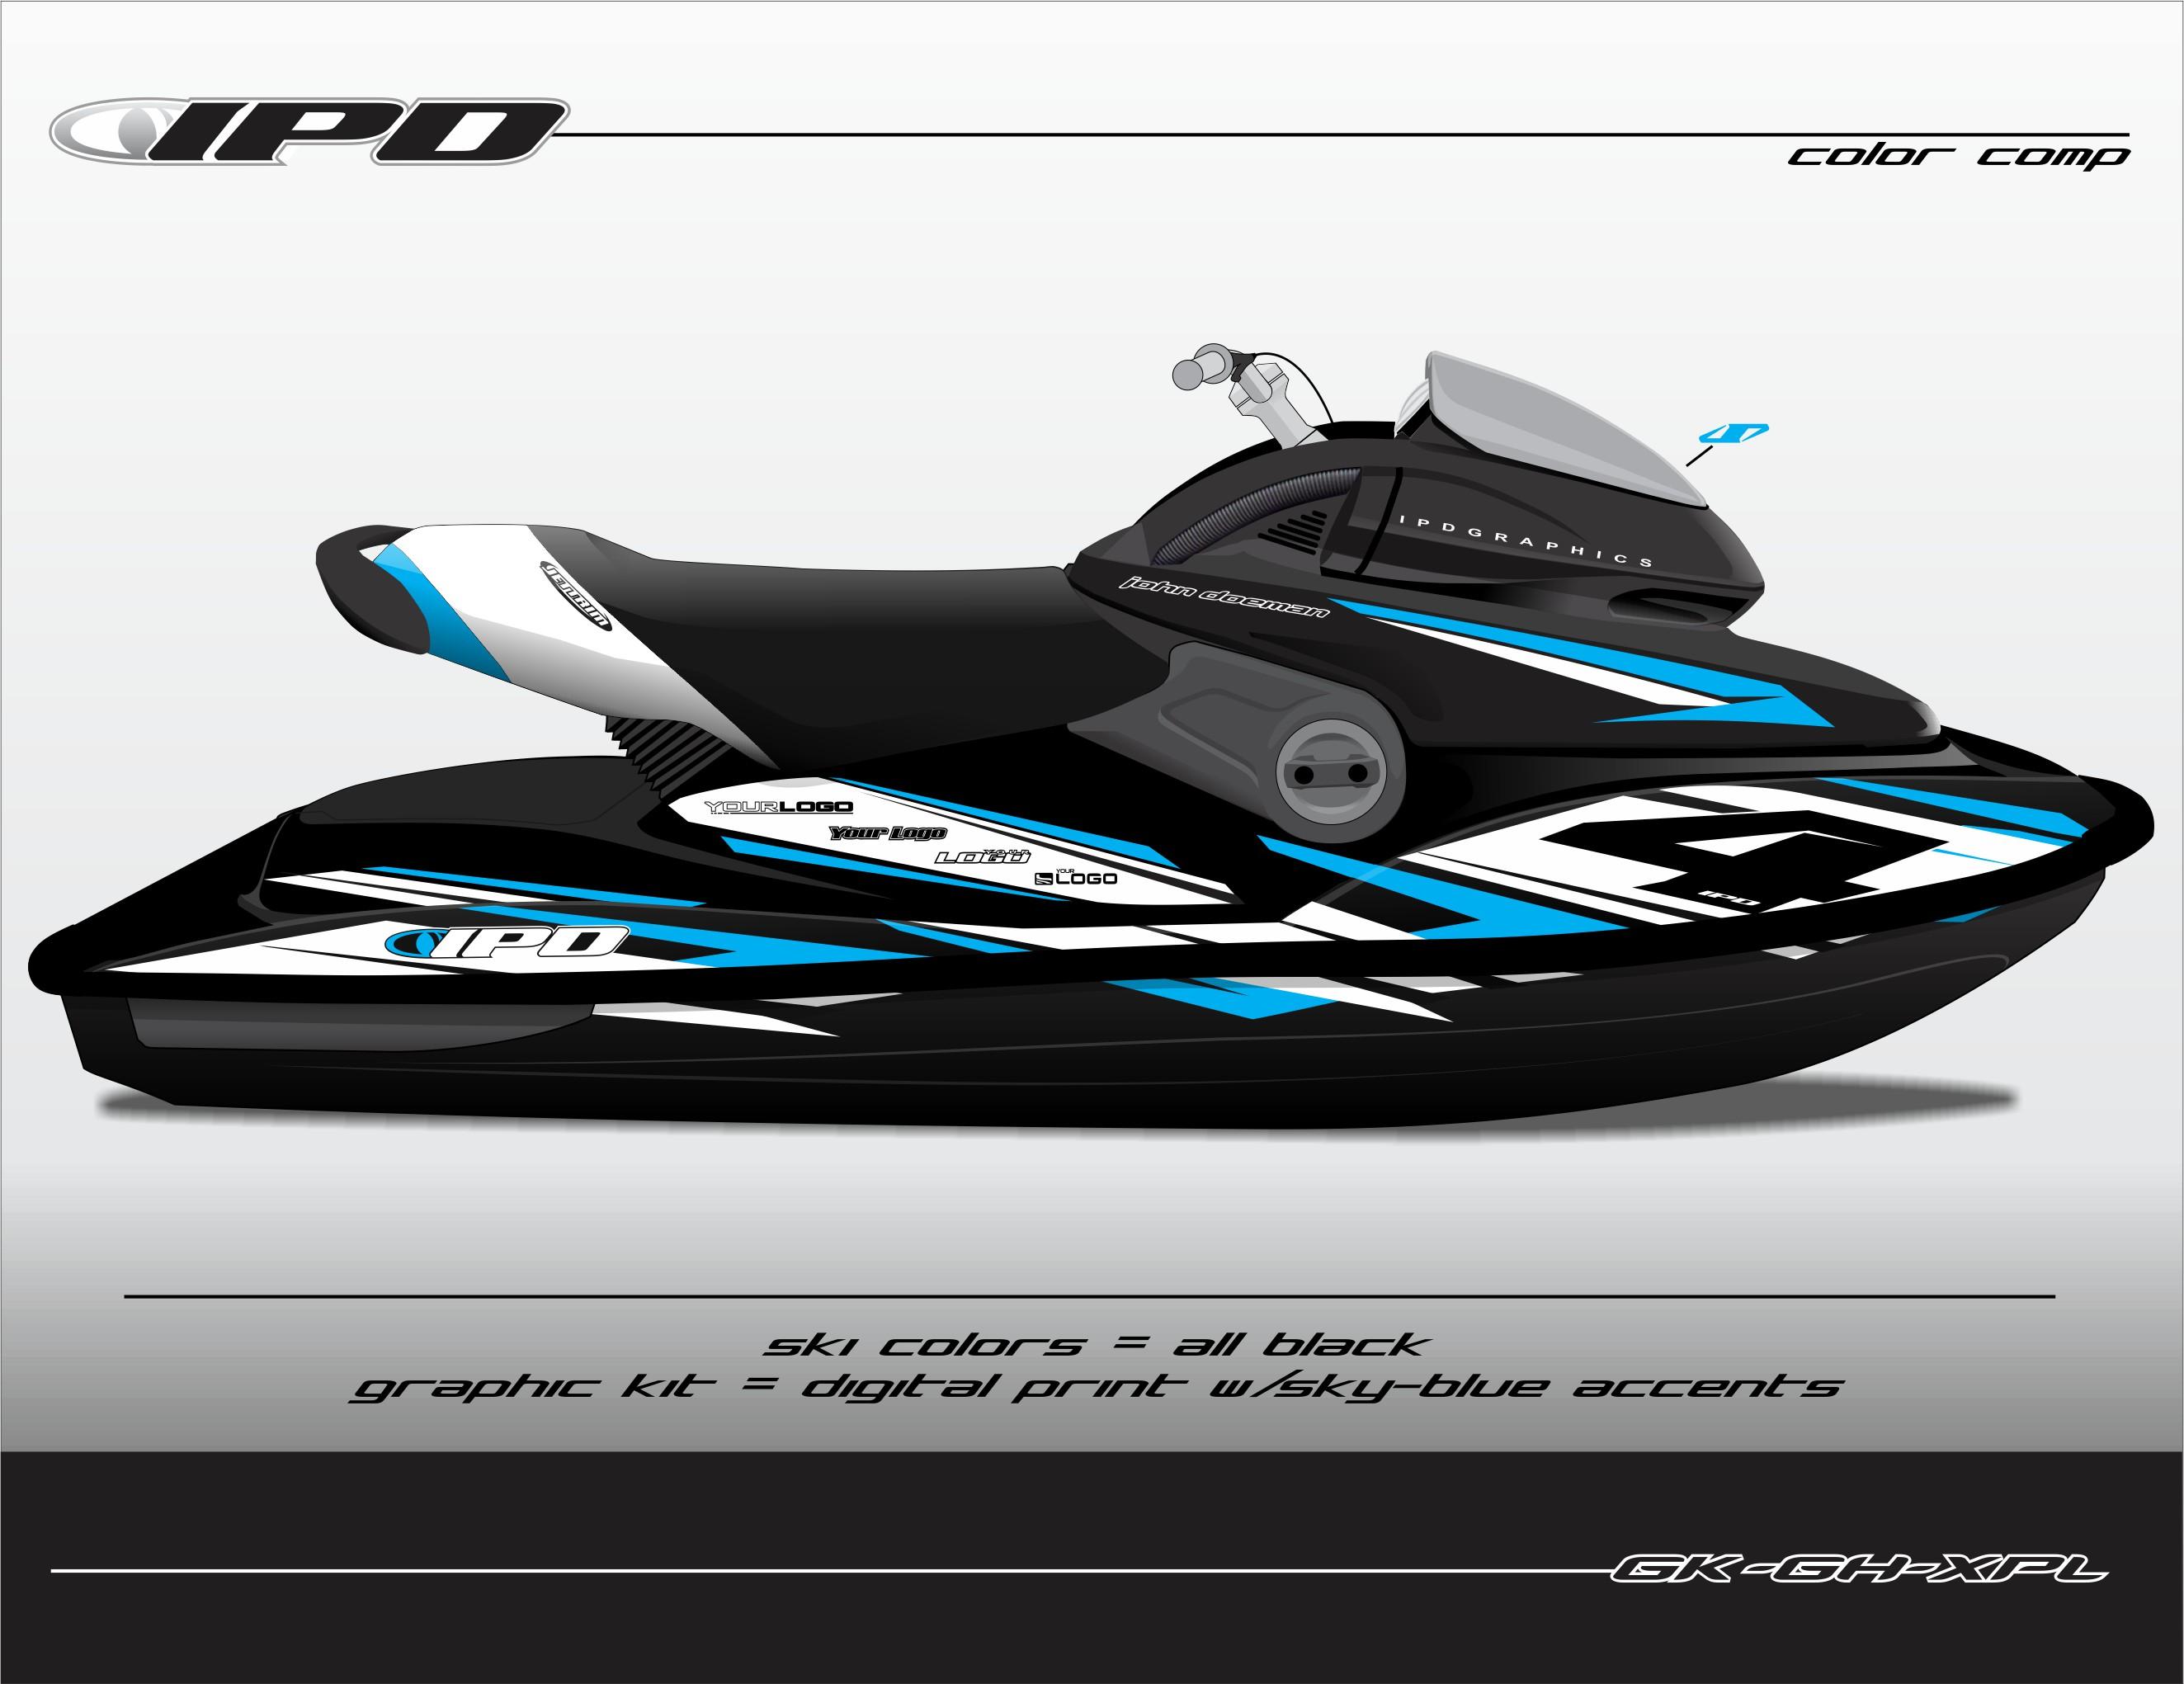 Sea Doo Xp Limited Graphics Kit Gh Design Ipd Jet Ski